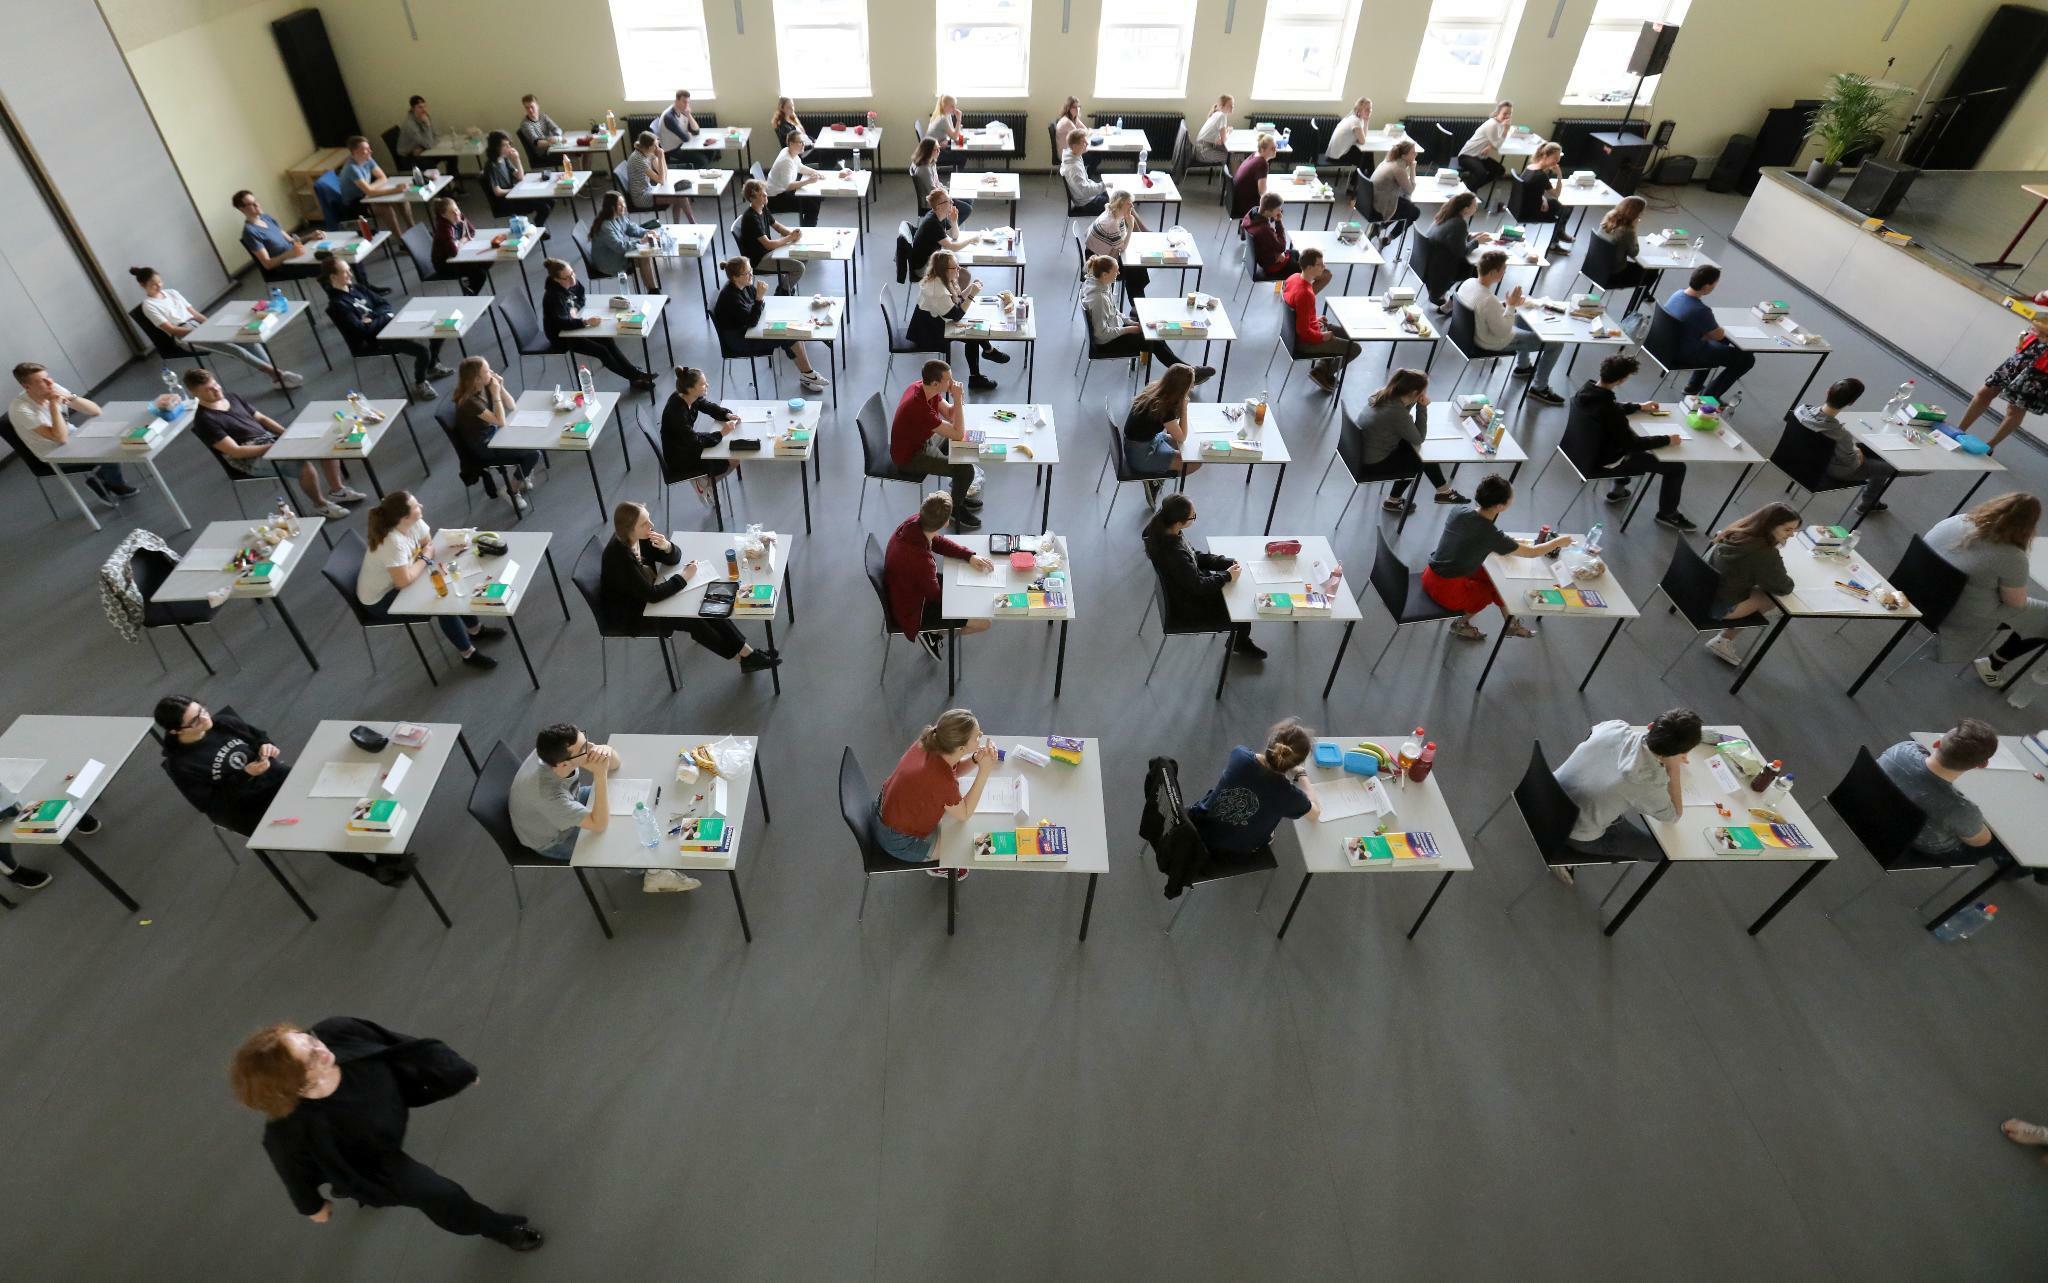 Abiturprüfungen: Immer mehr Schüler fallen durch das Abitur